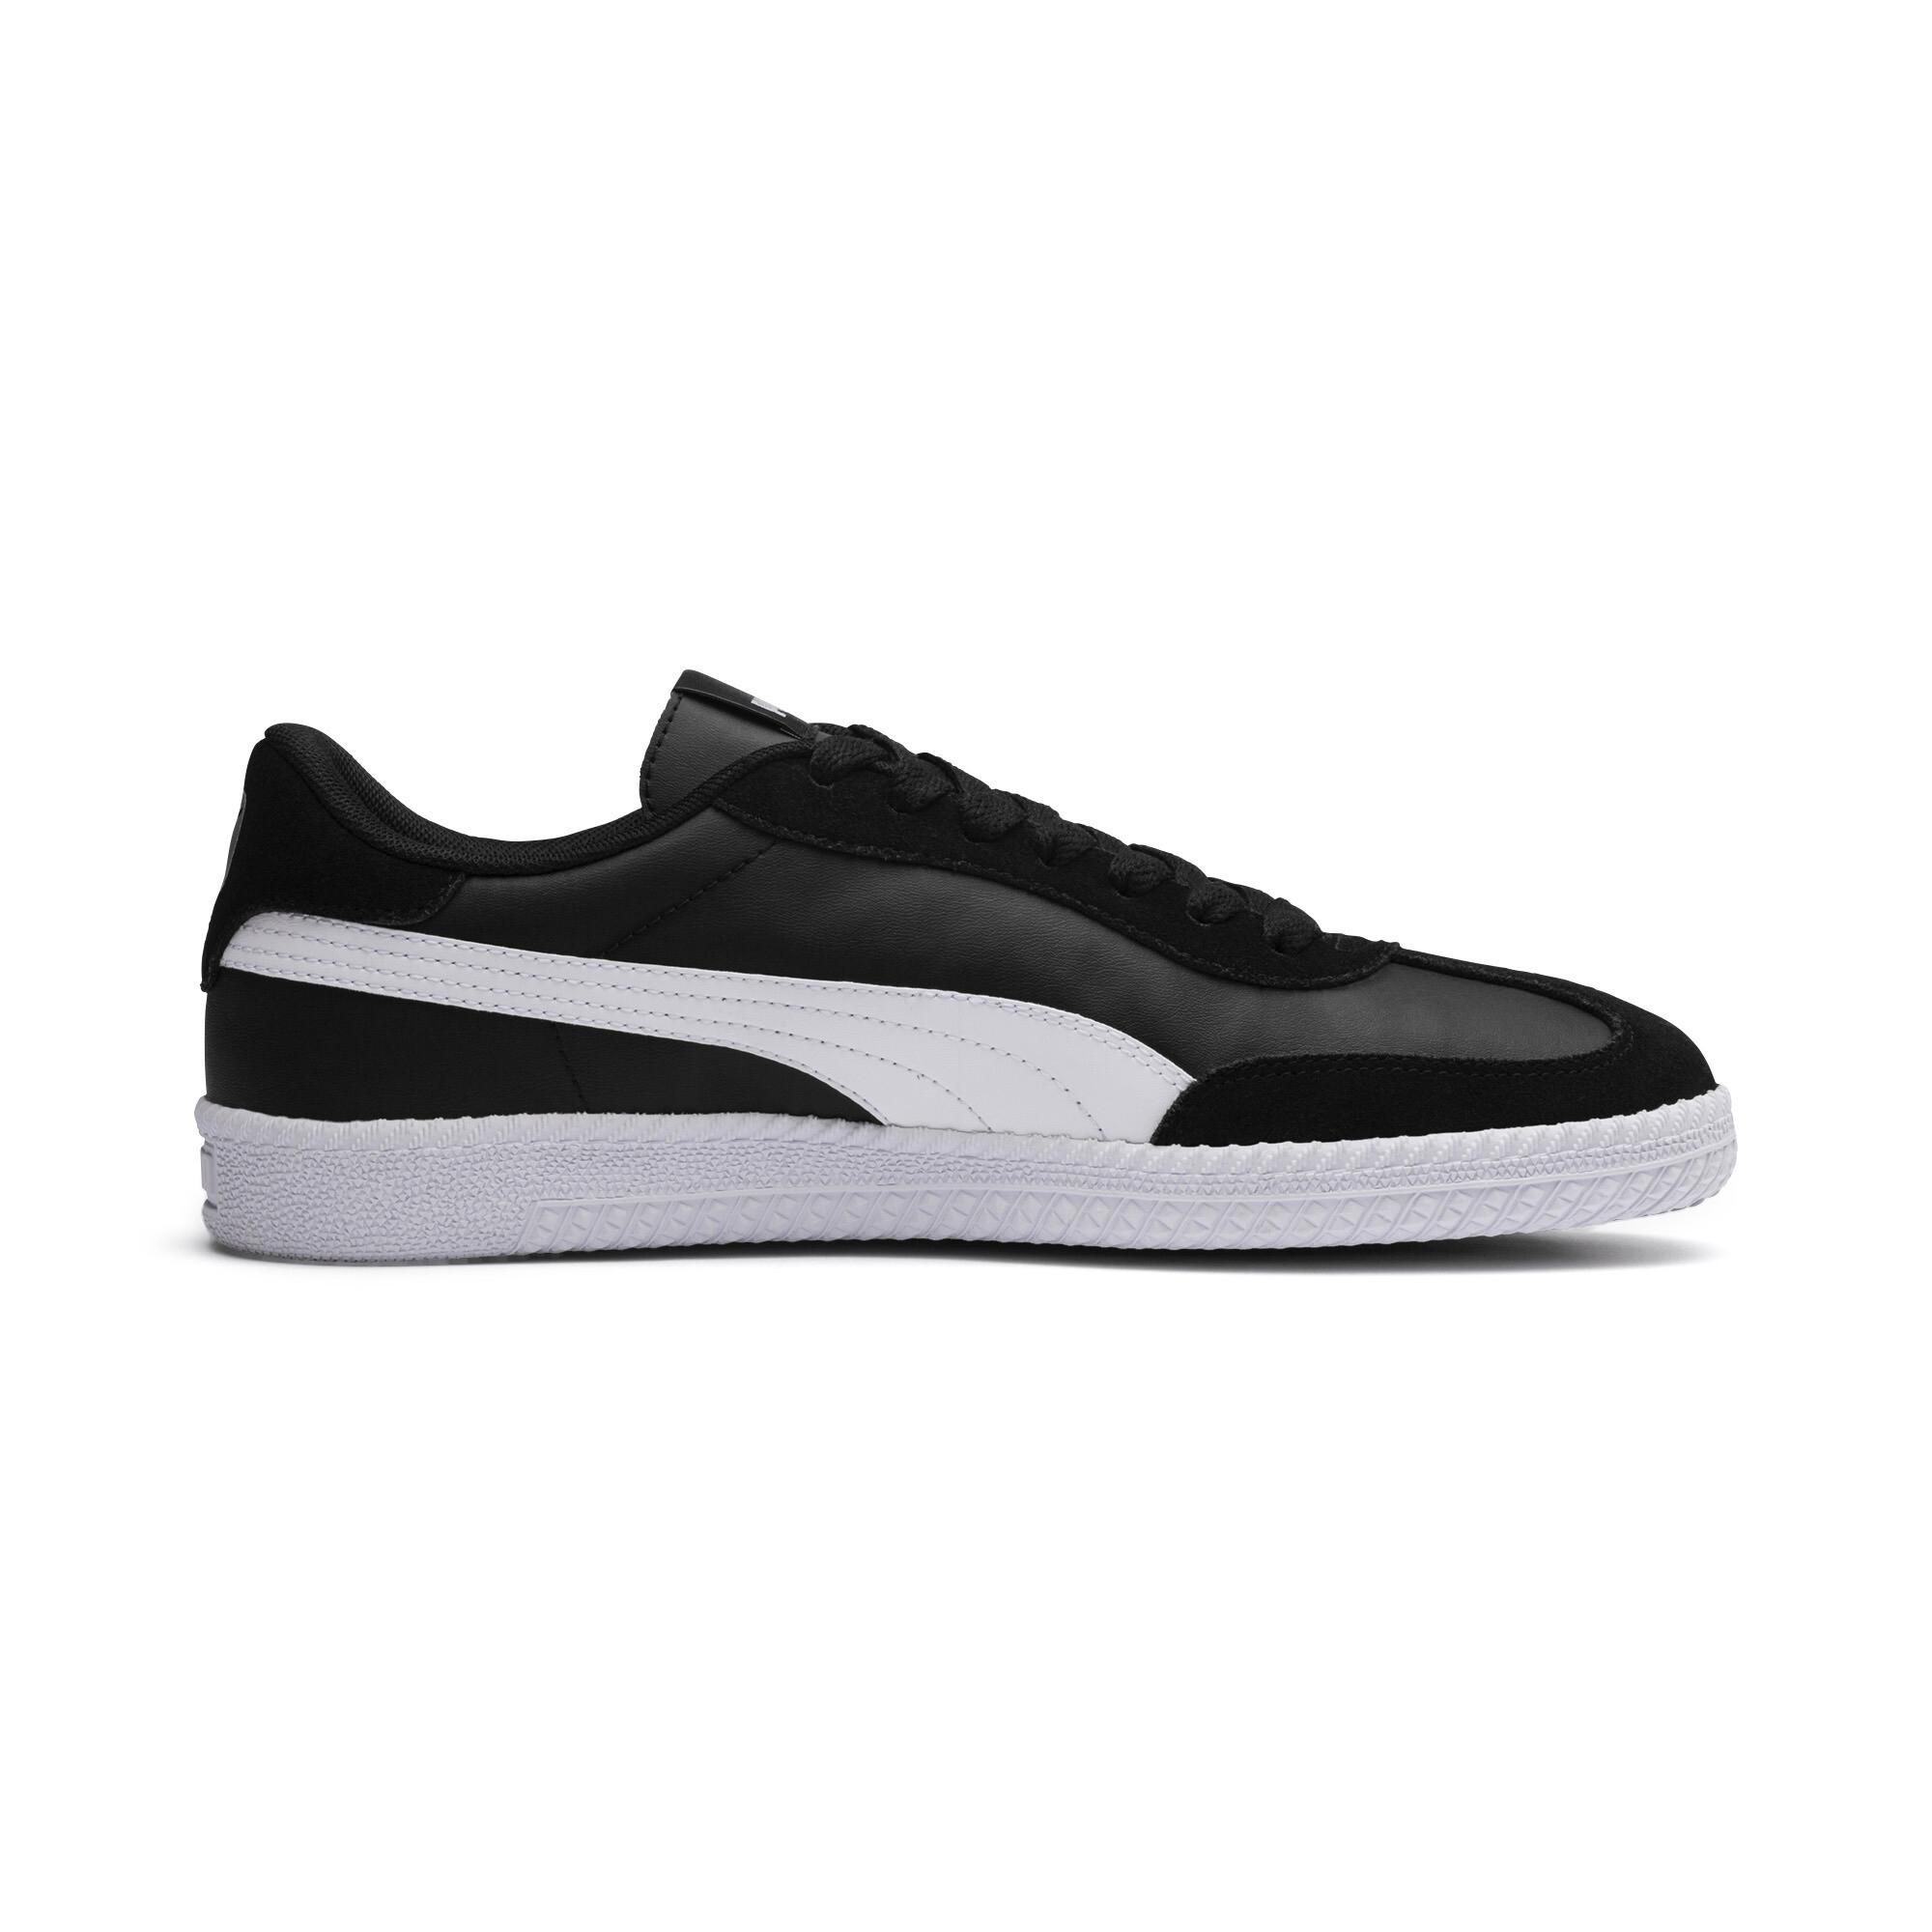 PUMA-Astro-Cup-Sneakers-Men-Shoe-Basics thumbnail 6